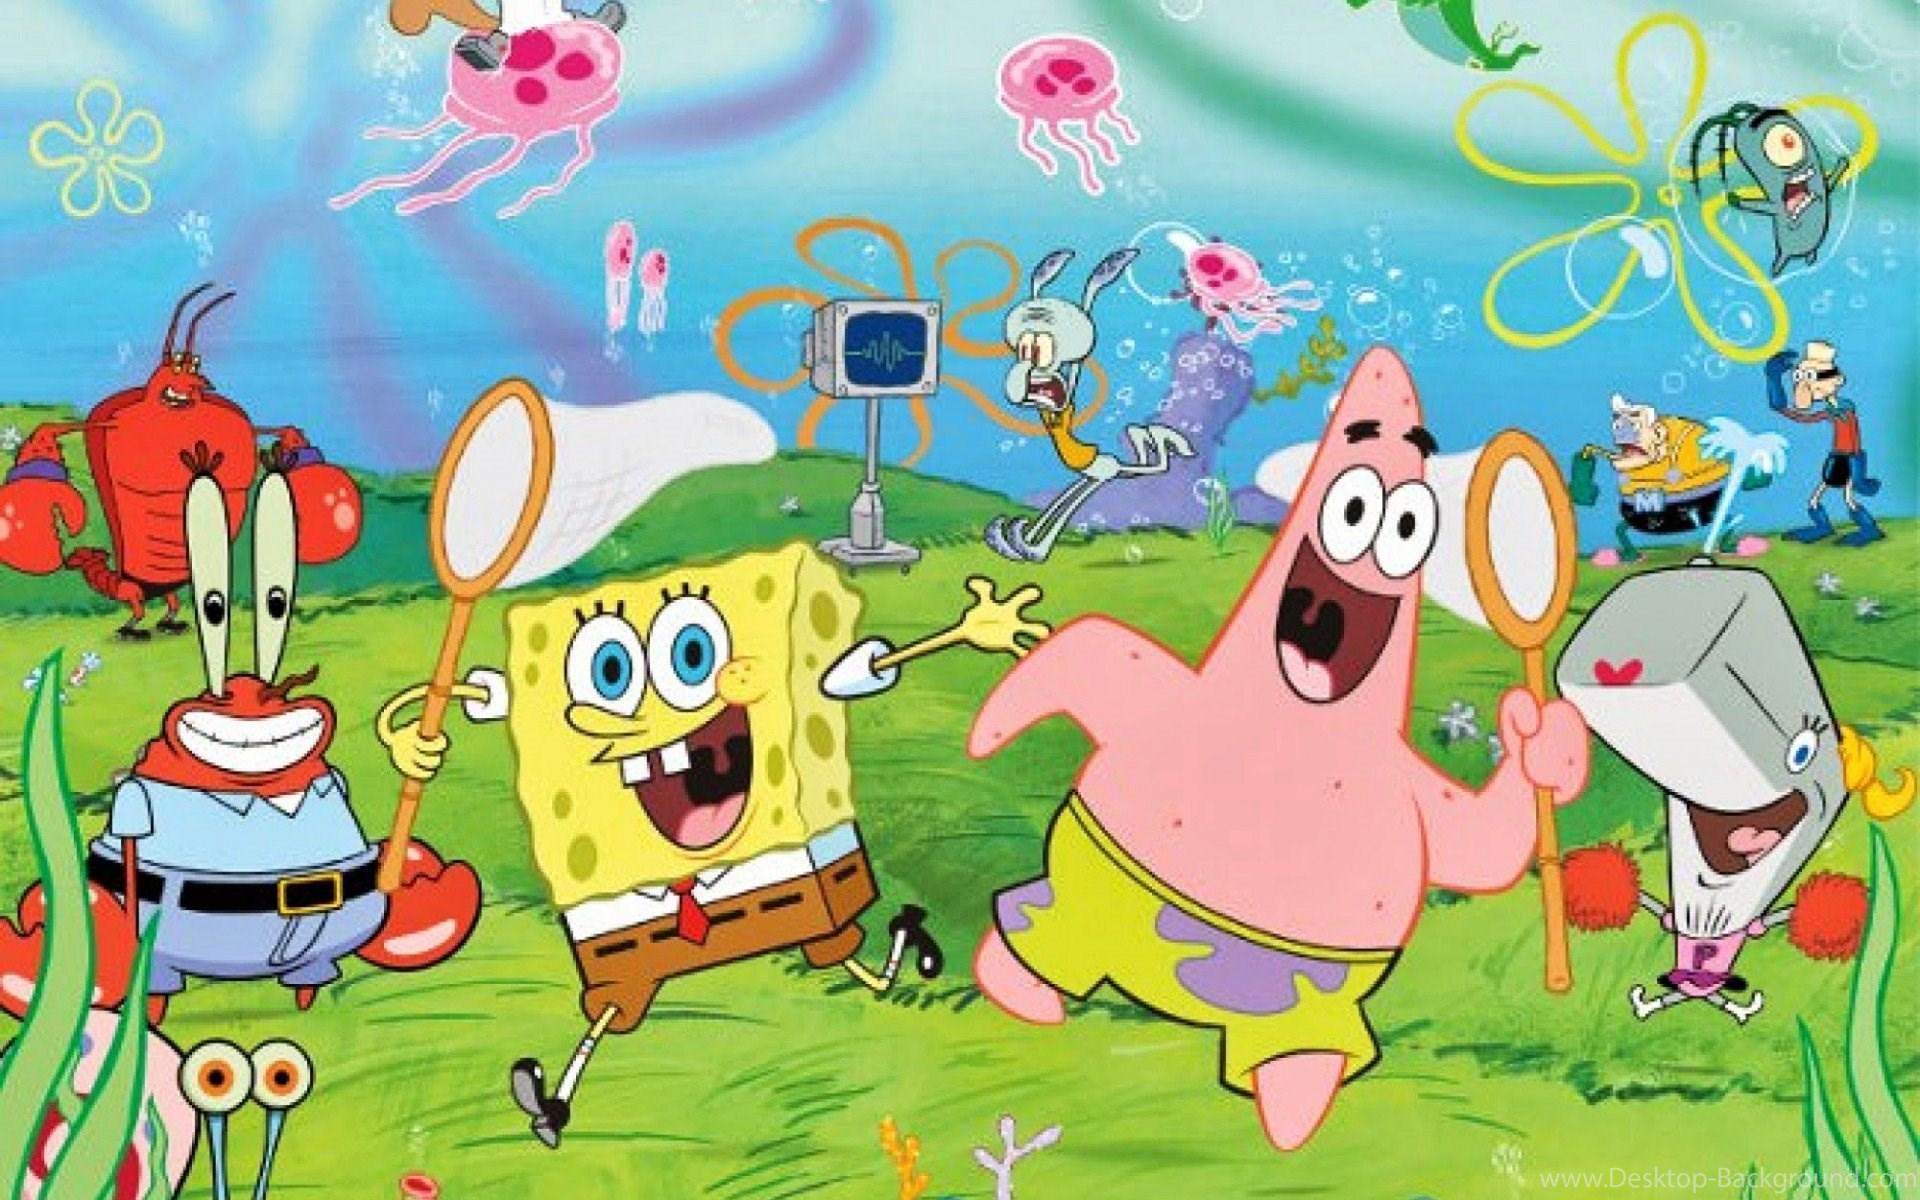 Spongebob And Friends Wallpapers Wallpaper Cave